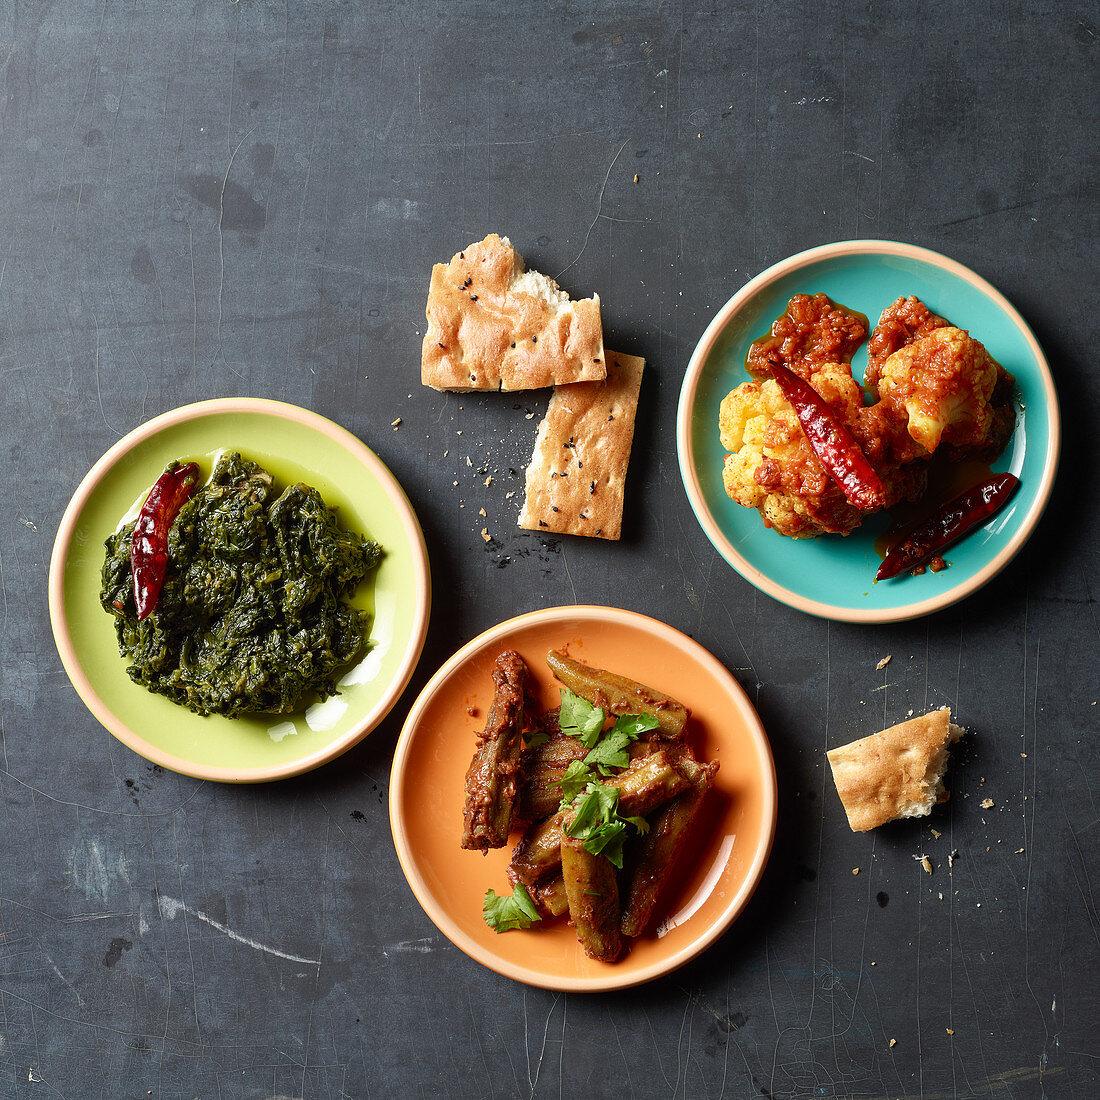 Afgahan food: okra, cauliflower and spinach